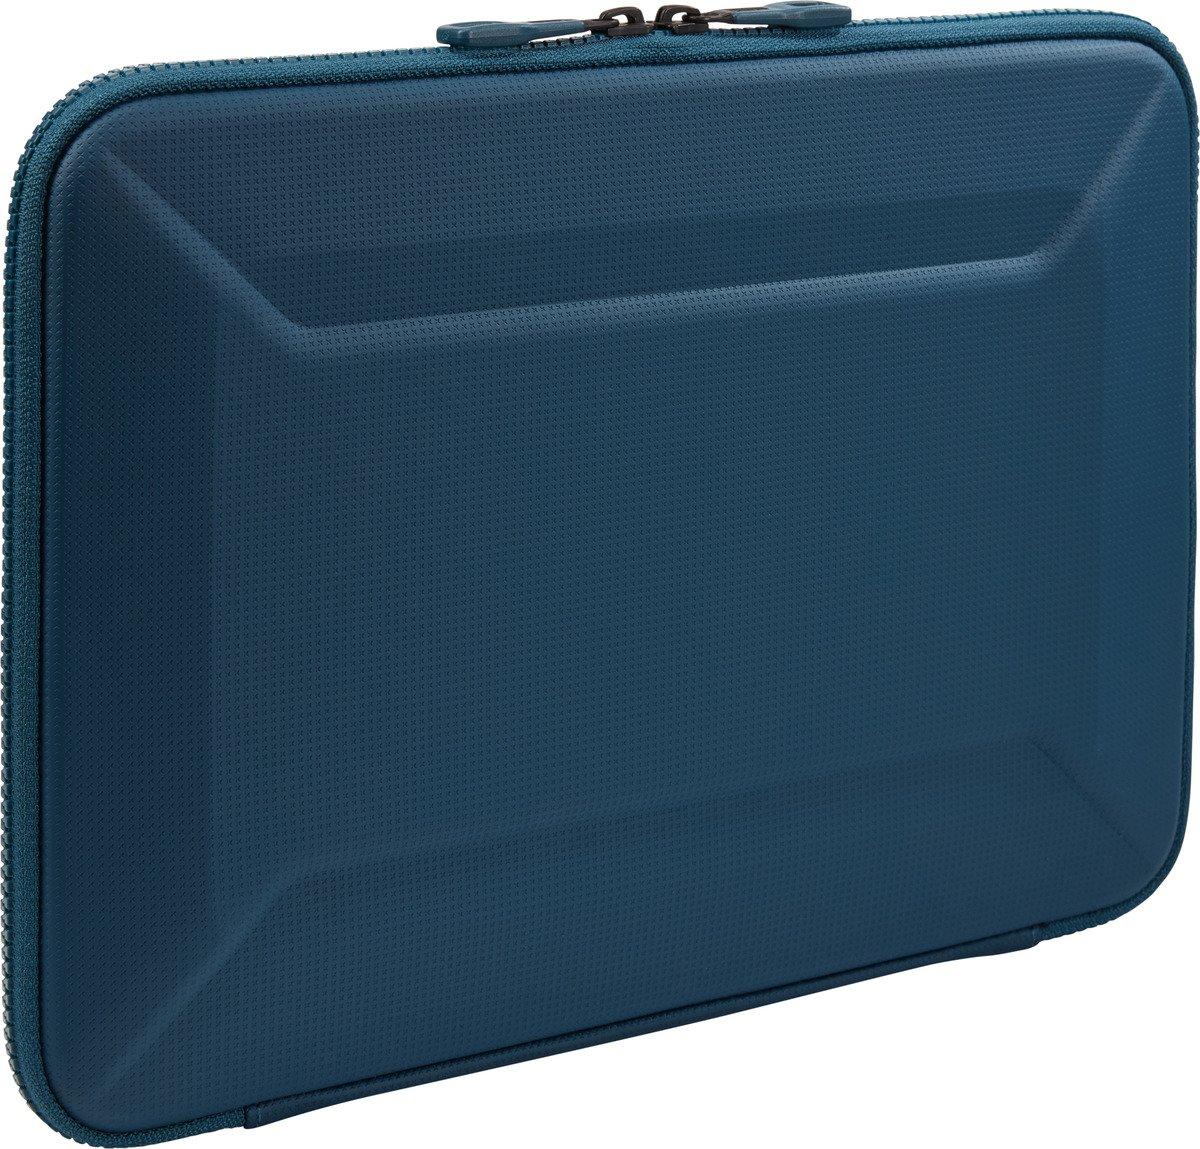 "Etui, Case na Macbook 13"" Thule Gauntlet - granatowy"